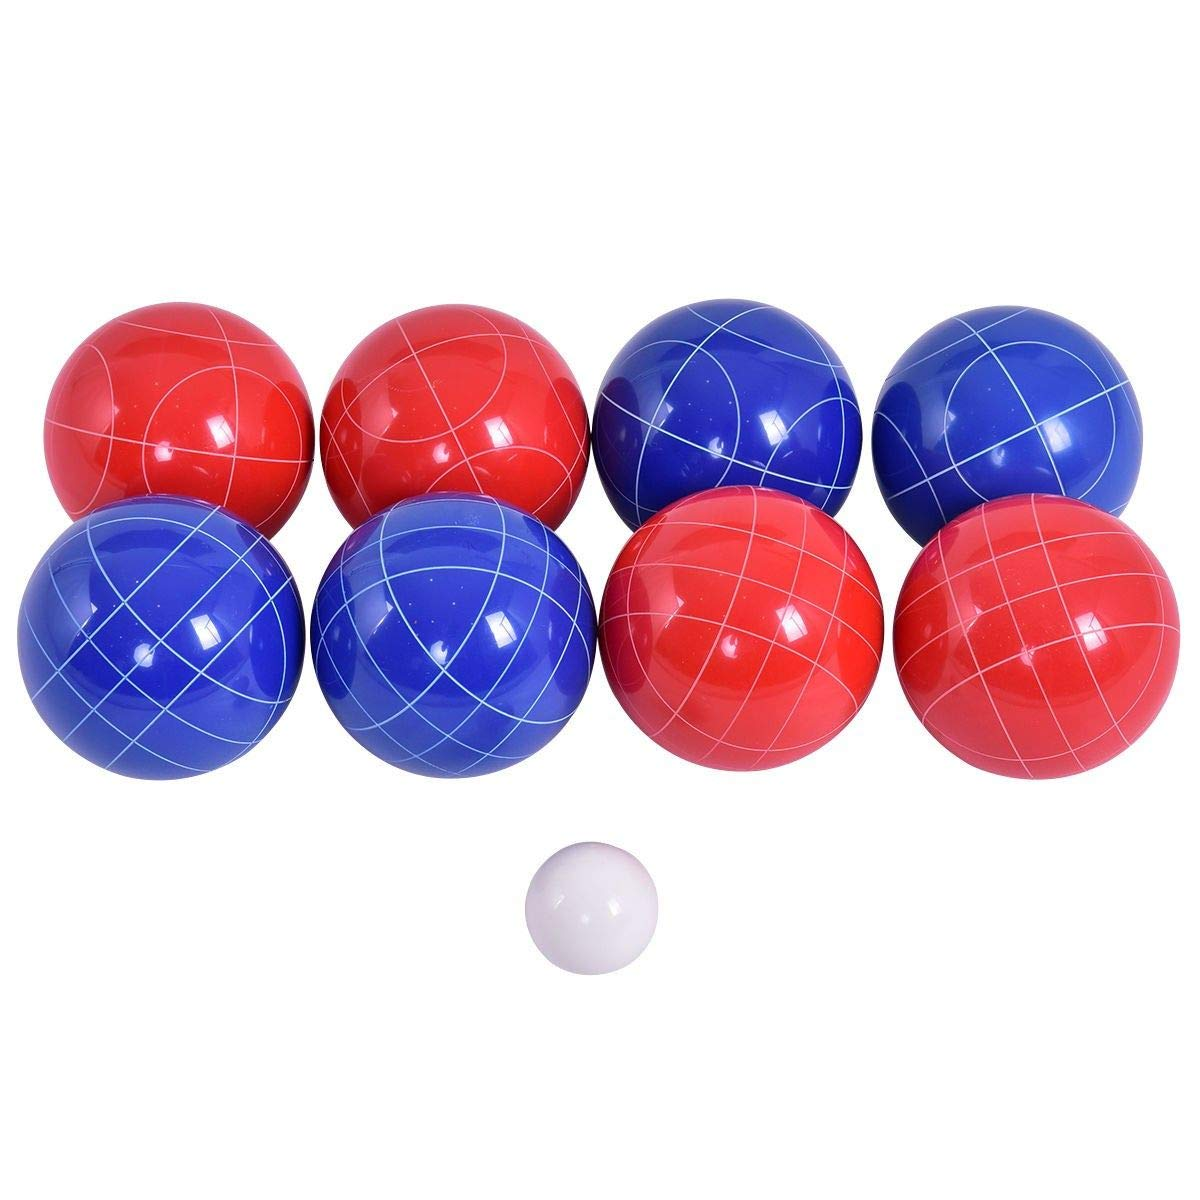 Aromzen Backyard Bocce Ball Set with 8 Balls